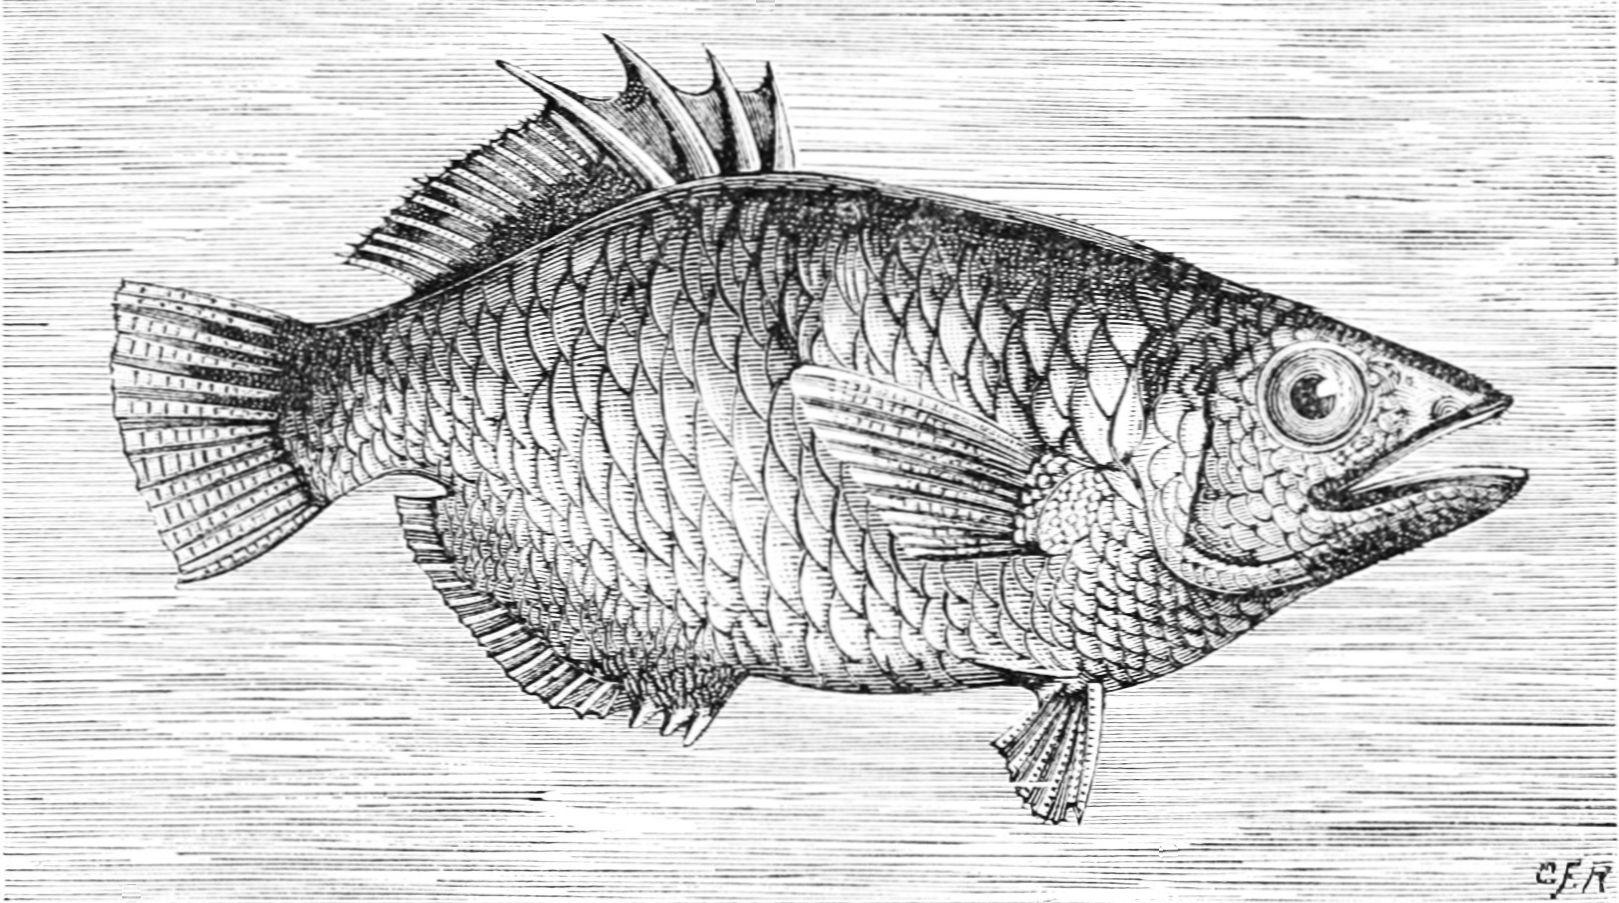 File:PSM V12 D319 Archer fish.jpg - Wikipedia, the free encyclopedia